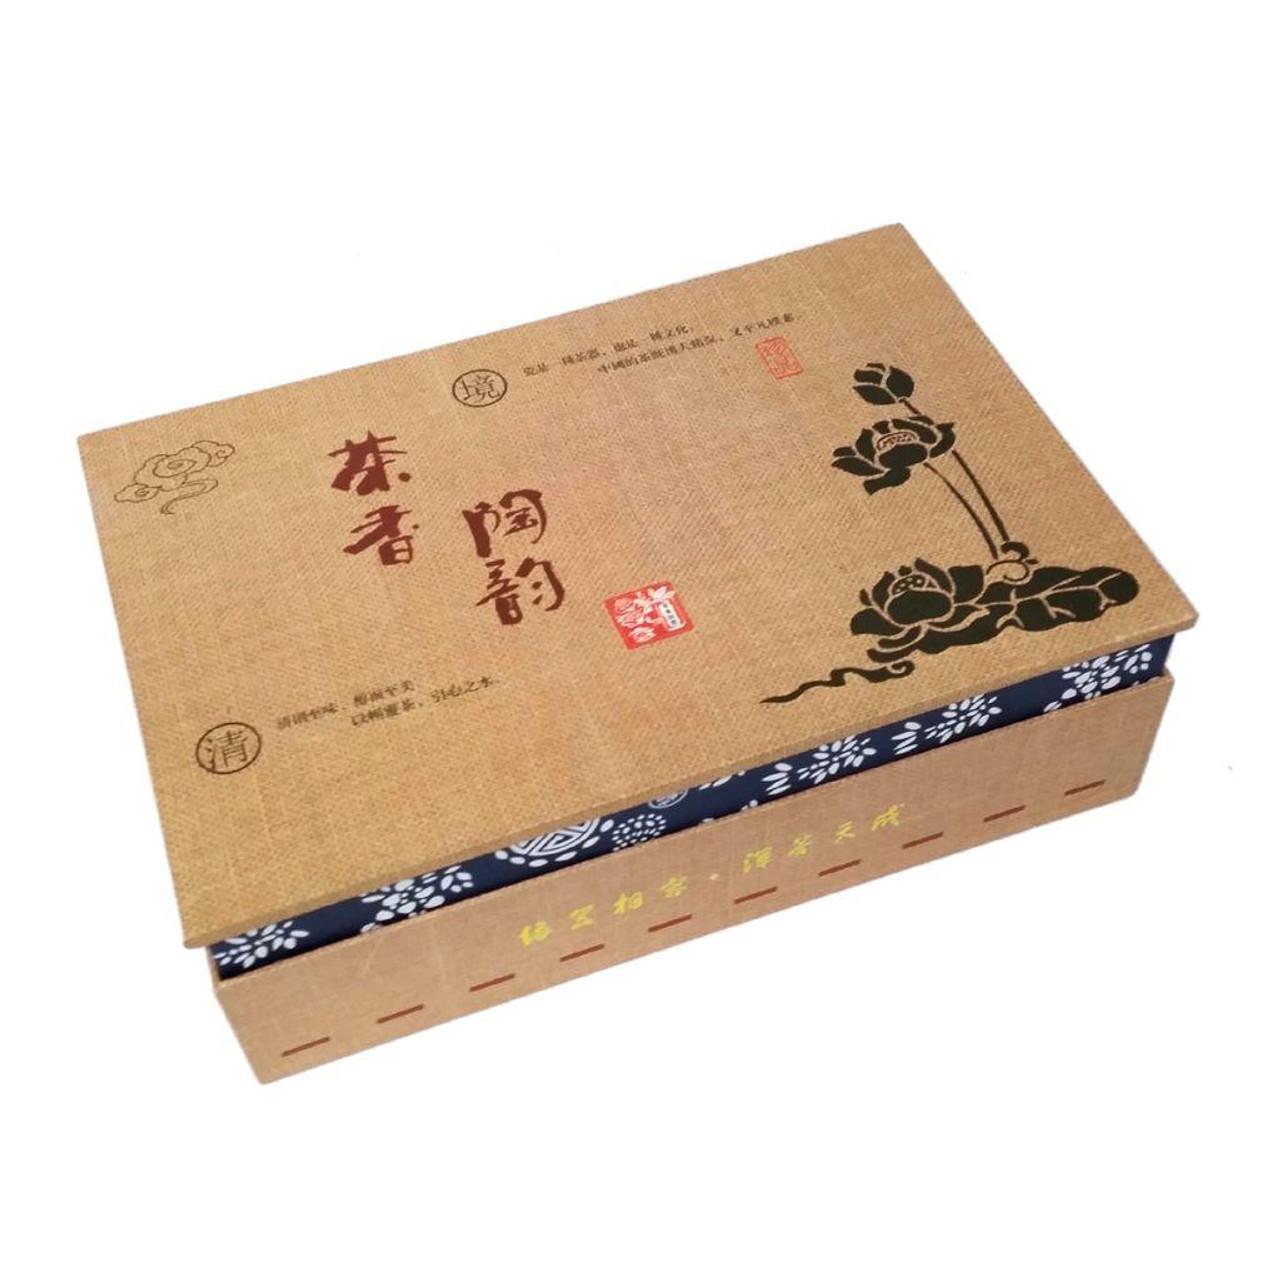 Chinese Hand Painted Bone China Tea Set - Morning Glory - Gift Boxed